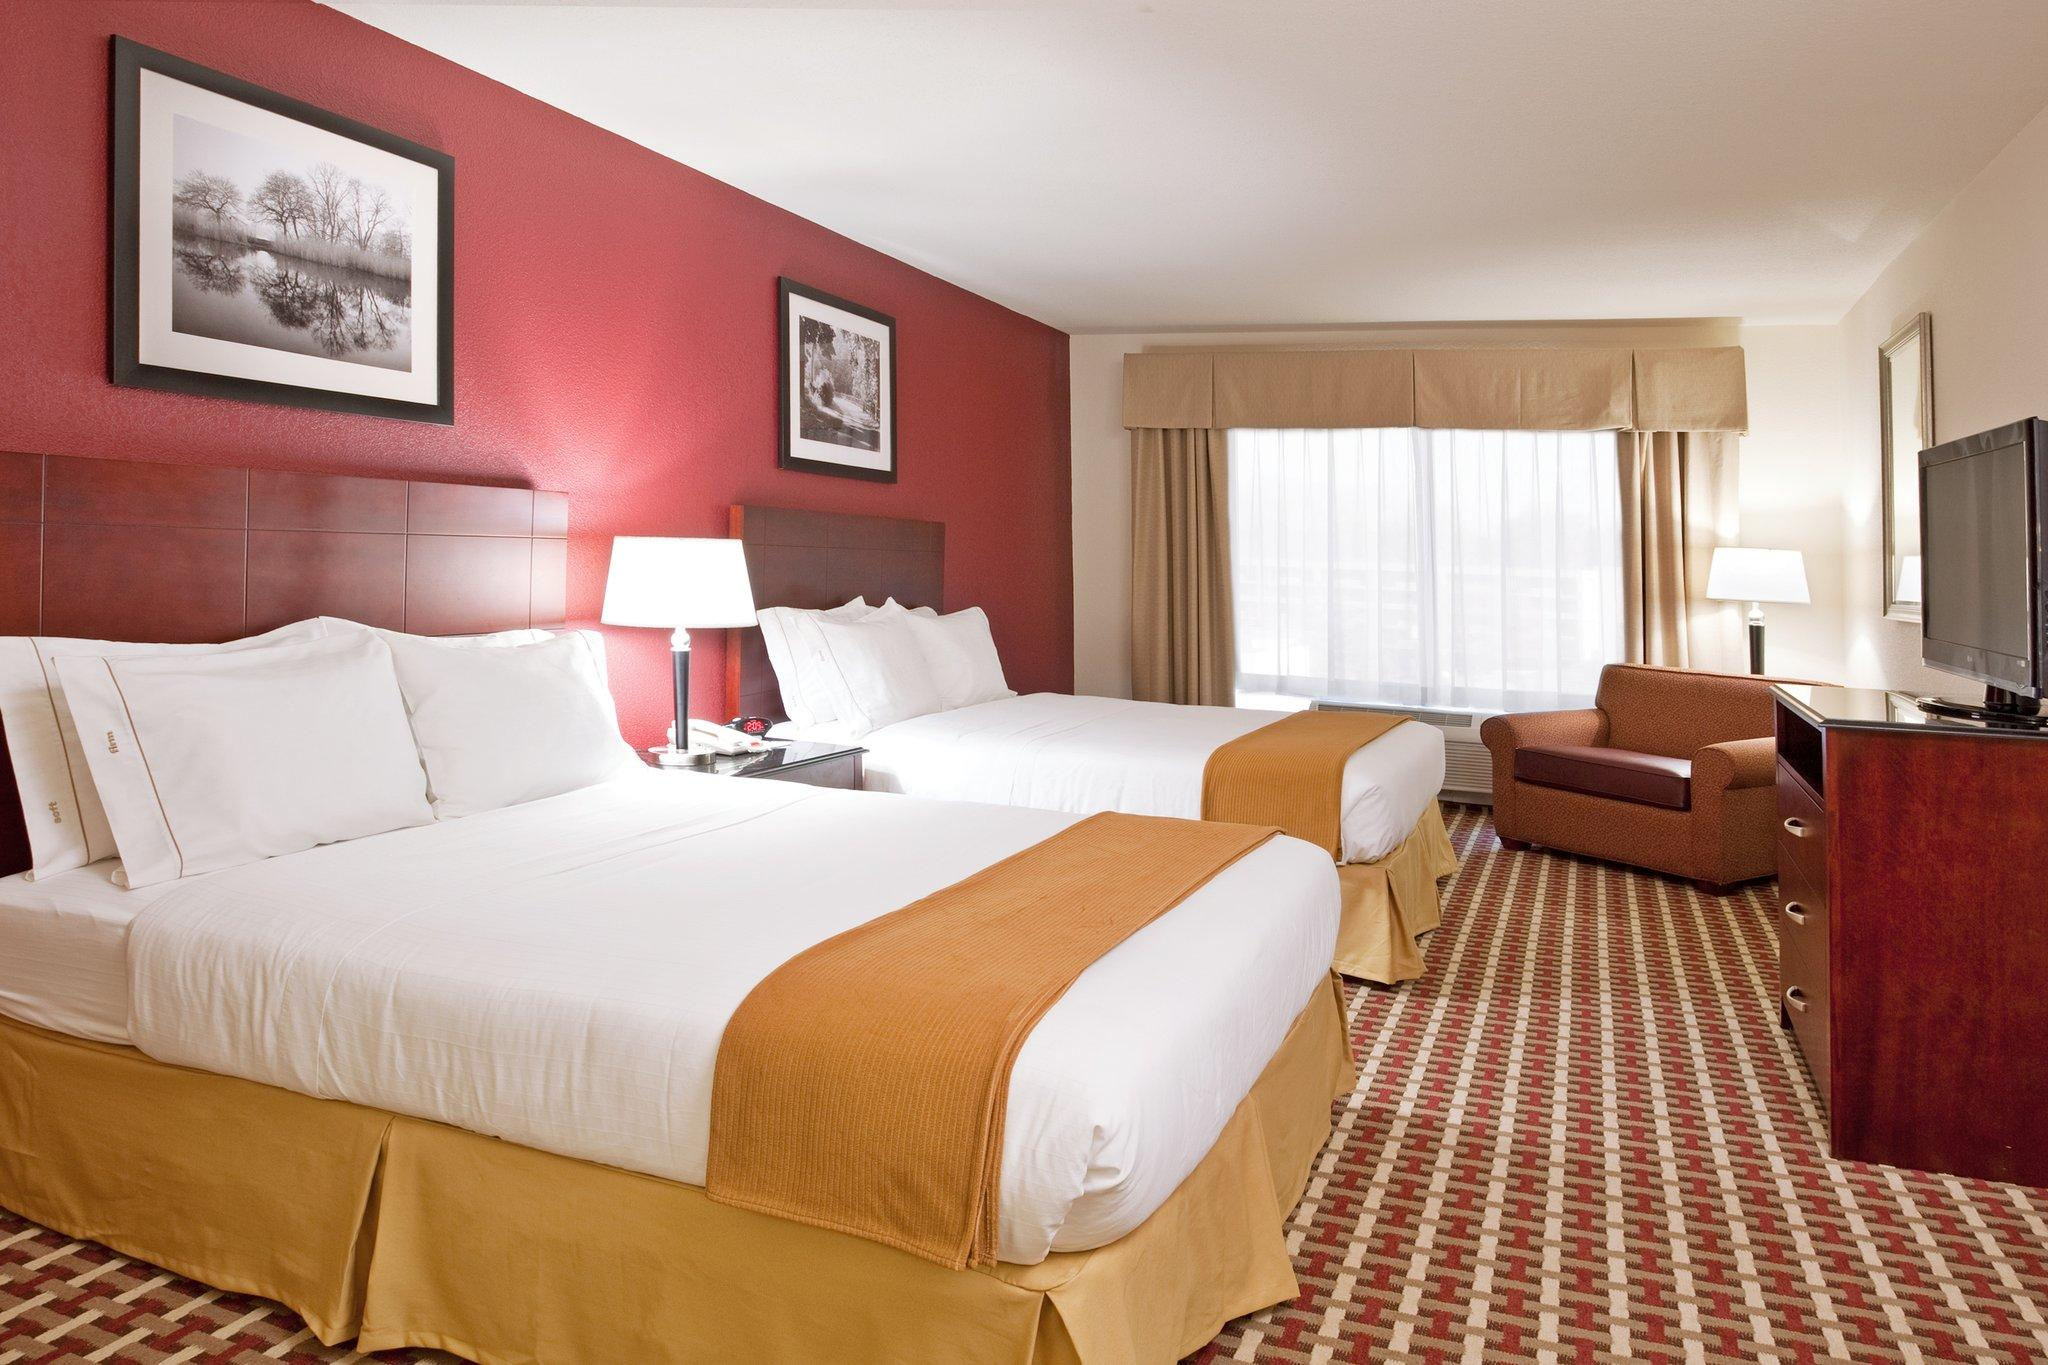 Holiday Inn Express Hotel & Suites Columbus University Area - OSU